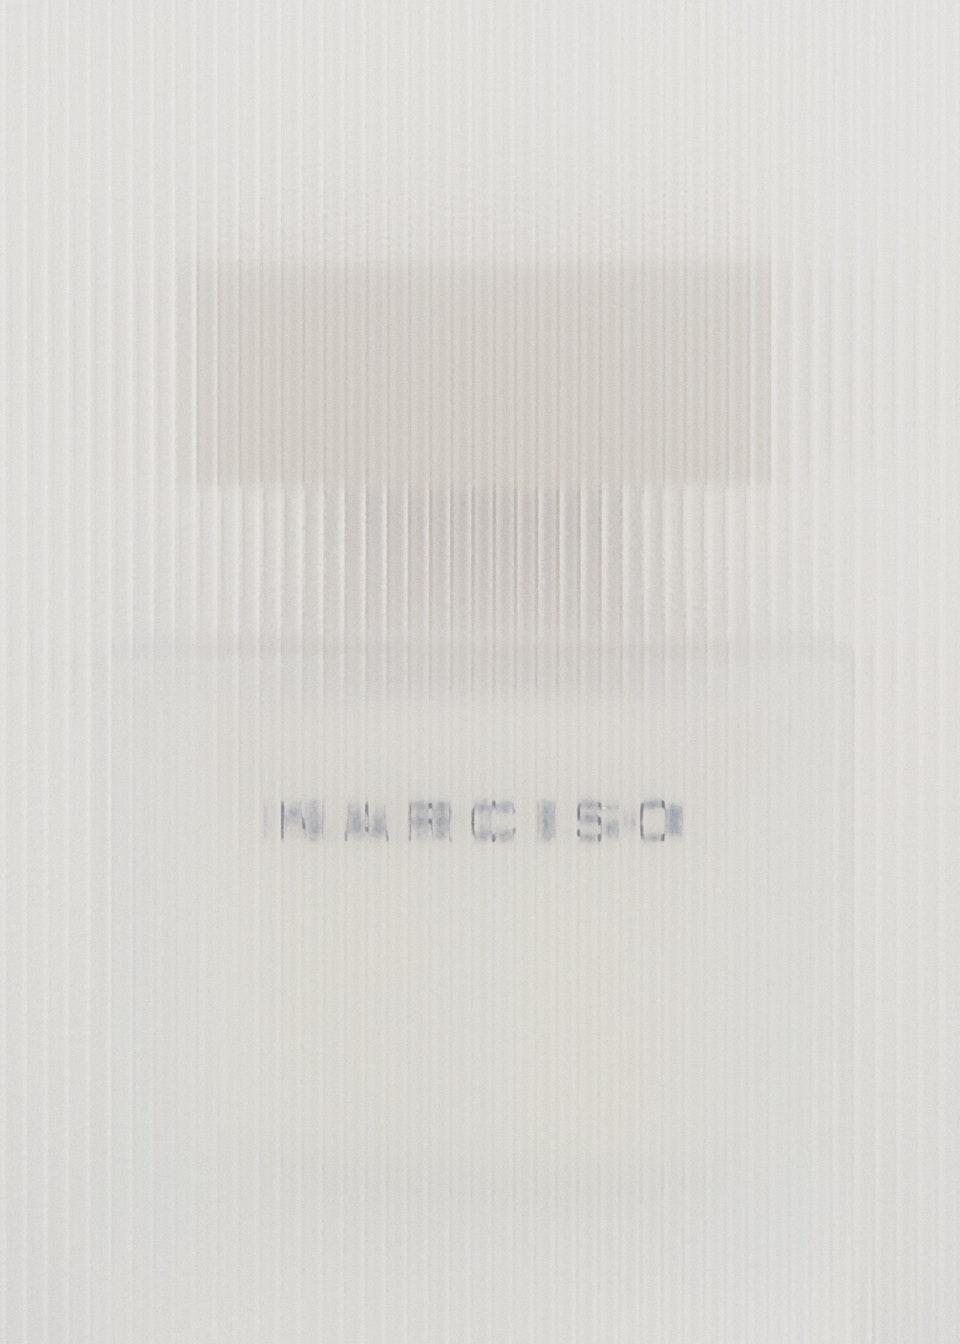 Narciso Rodriguez Perfume - Stills BLOOM_NARCISO_PARFUM_6